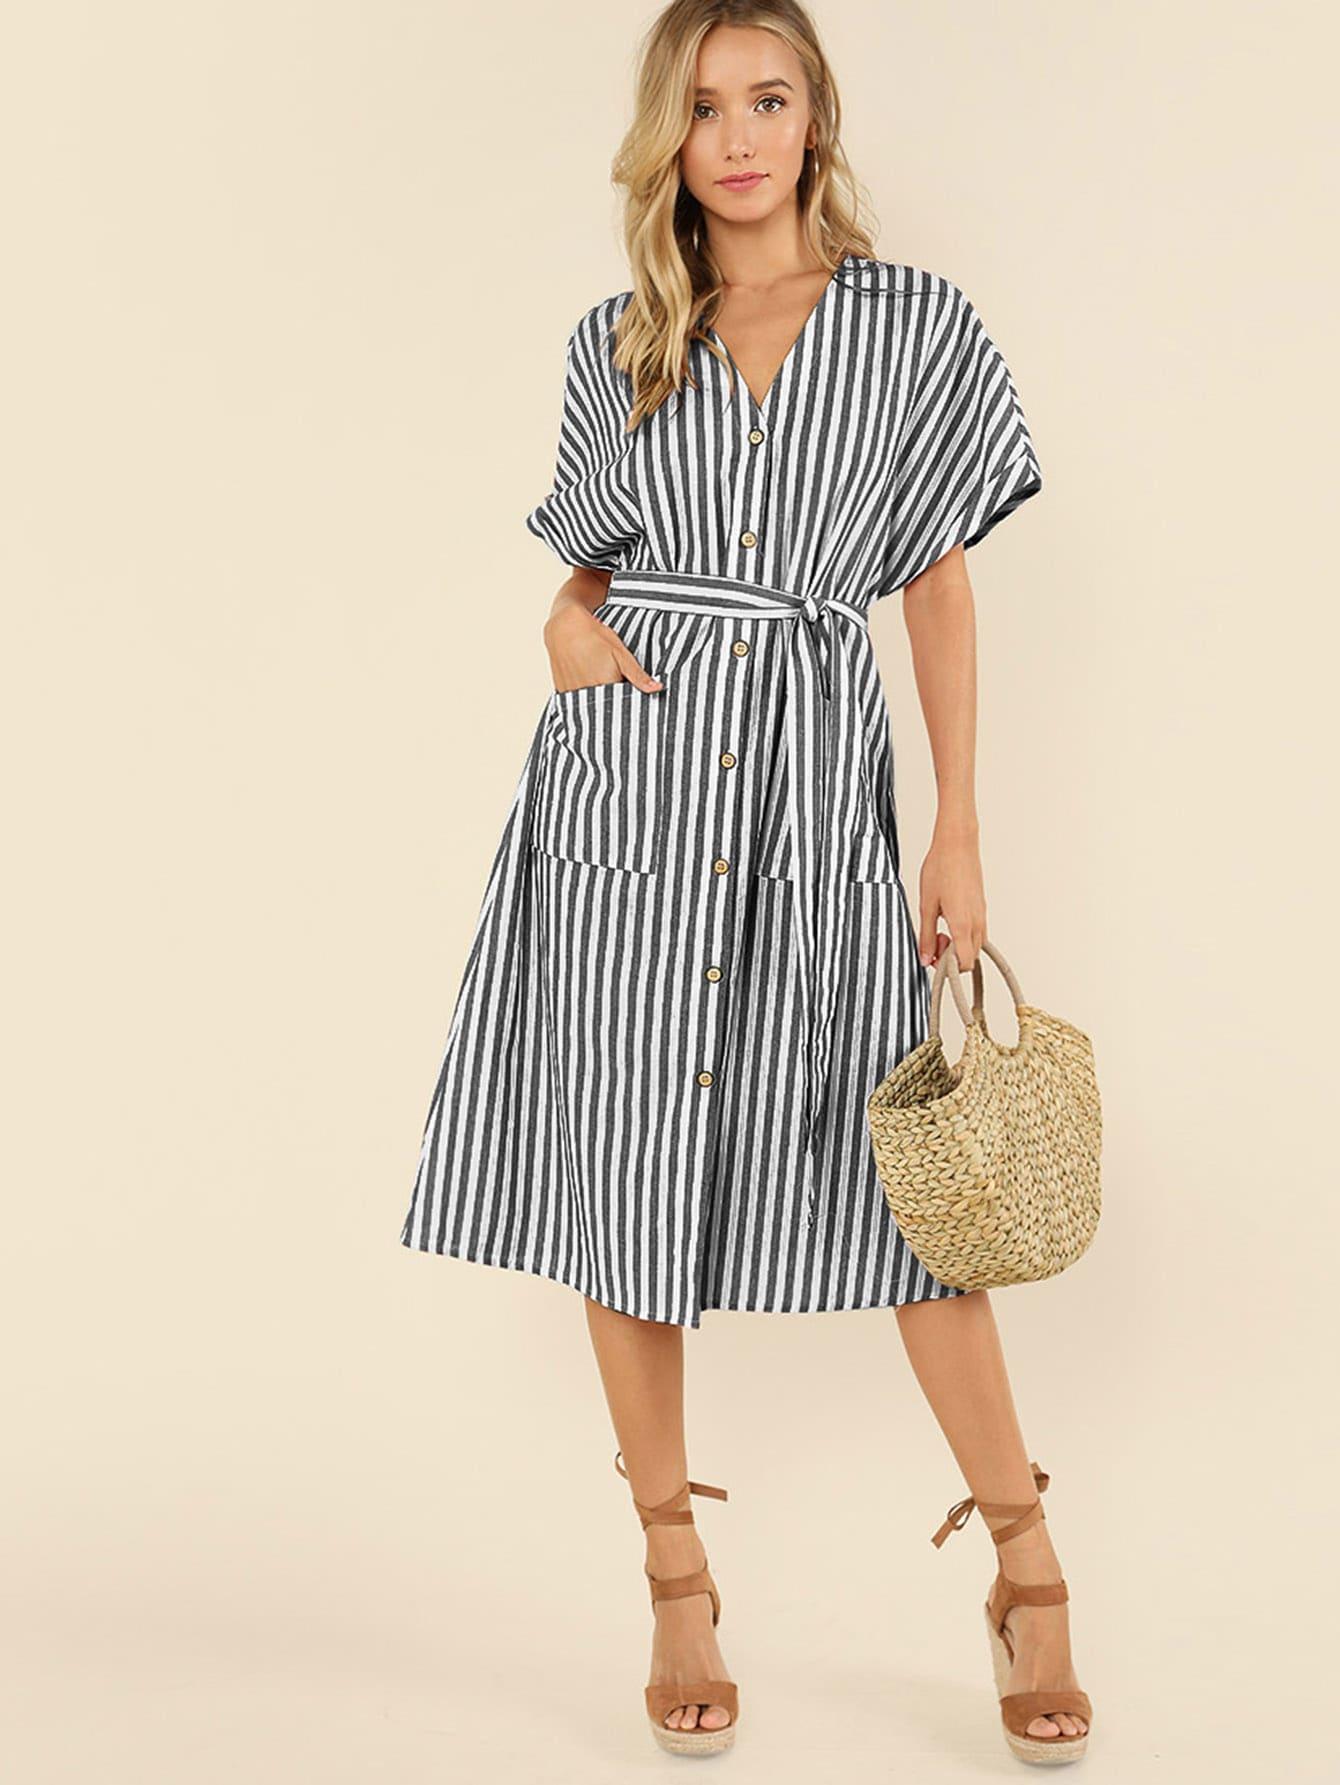 Button Up Pocket Front Belted Striped Dress fold over button up front striped shirt dress